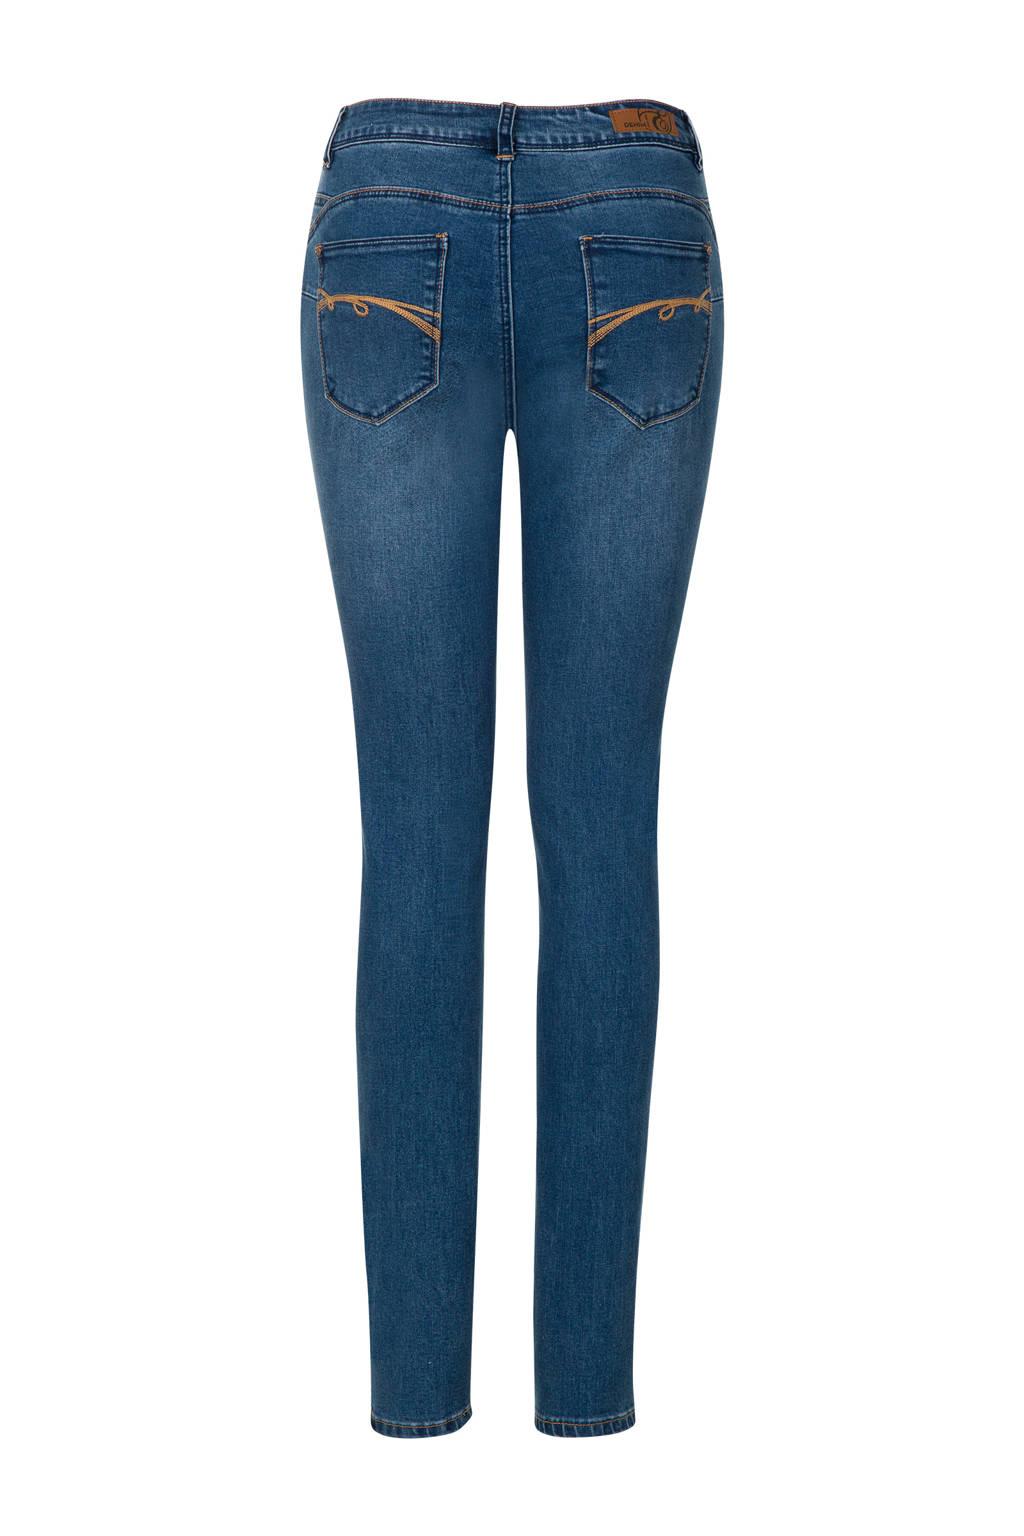 36 Etam Lang Puck Inch Miss Skinny Jeans xfqvRXSX